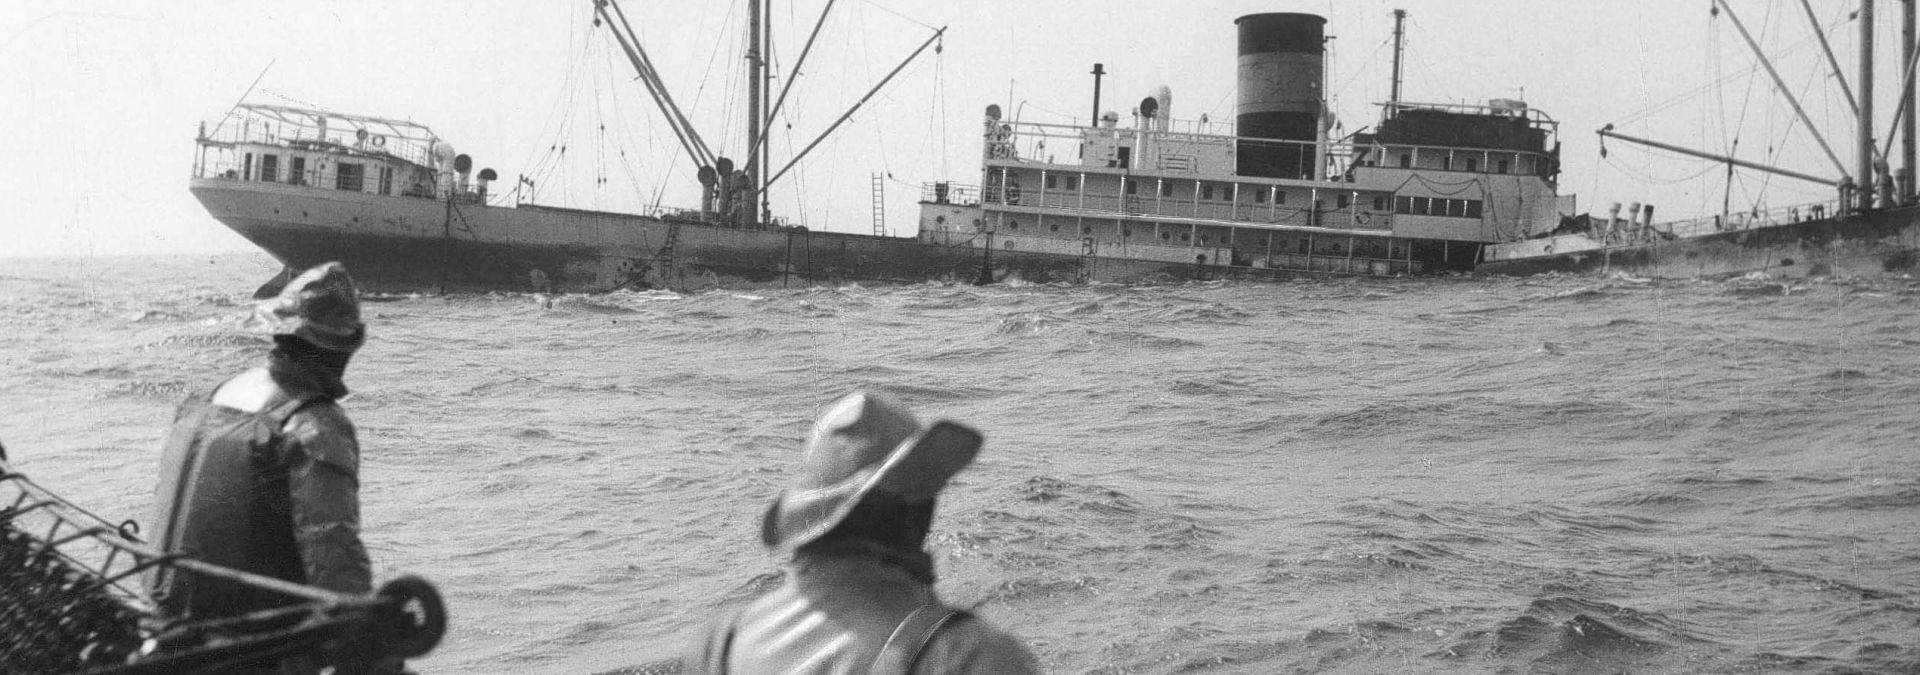 1956 KNRM redding Ecuador Terschelling - reddingboot Brandaris